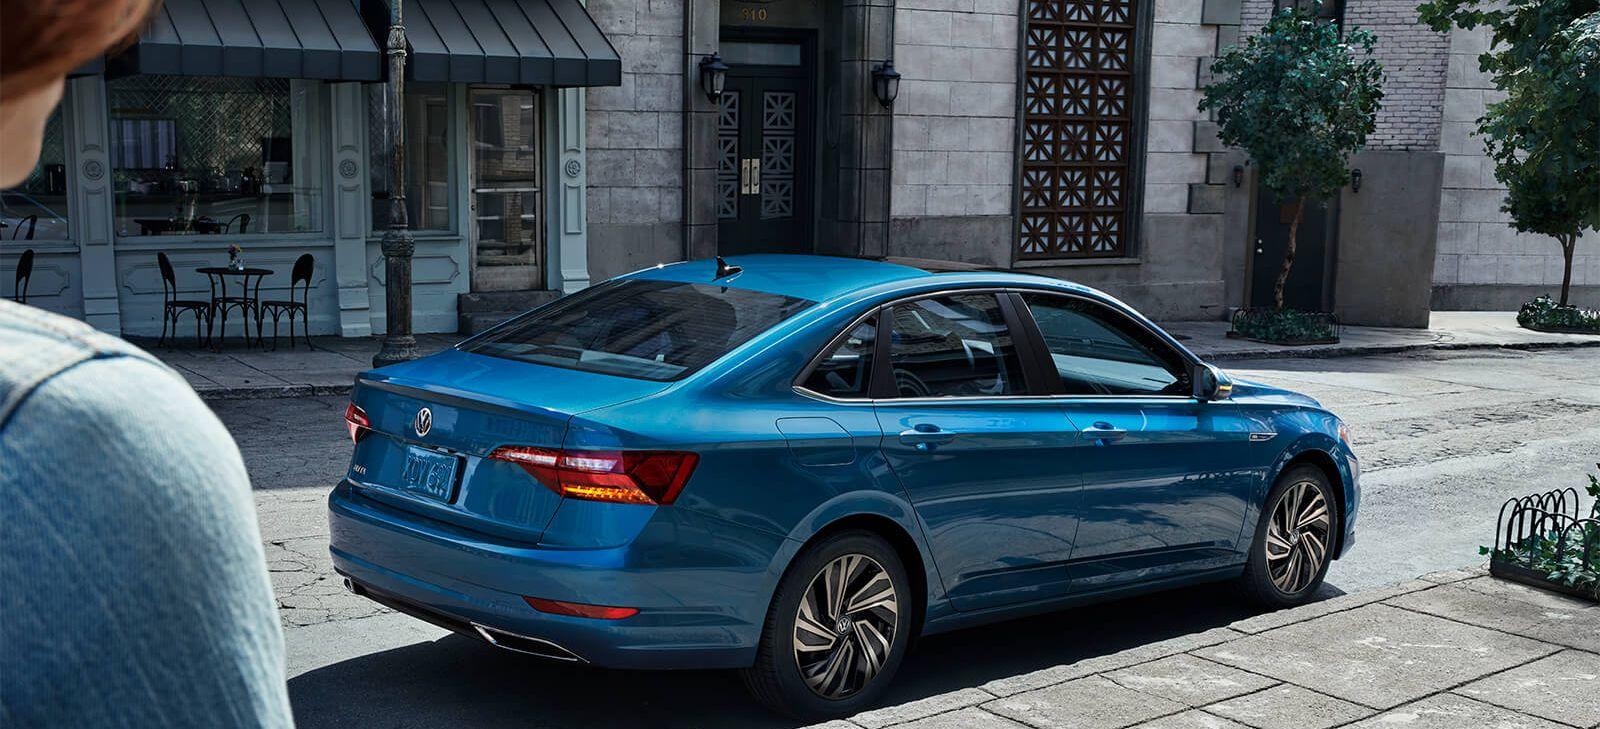 Volkswagen Jetta 2019 para leasing cerca de Bowie, MD